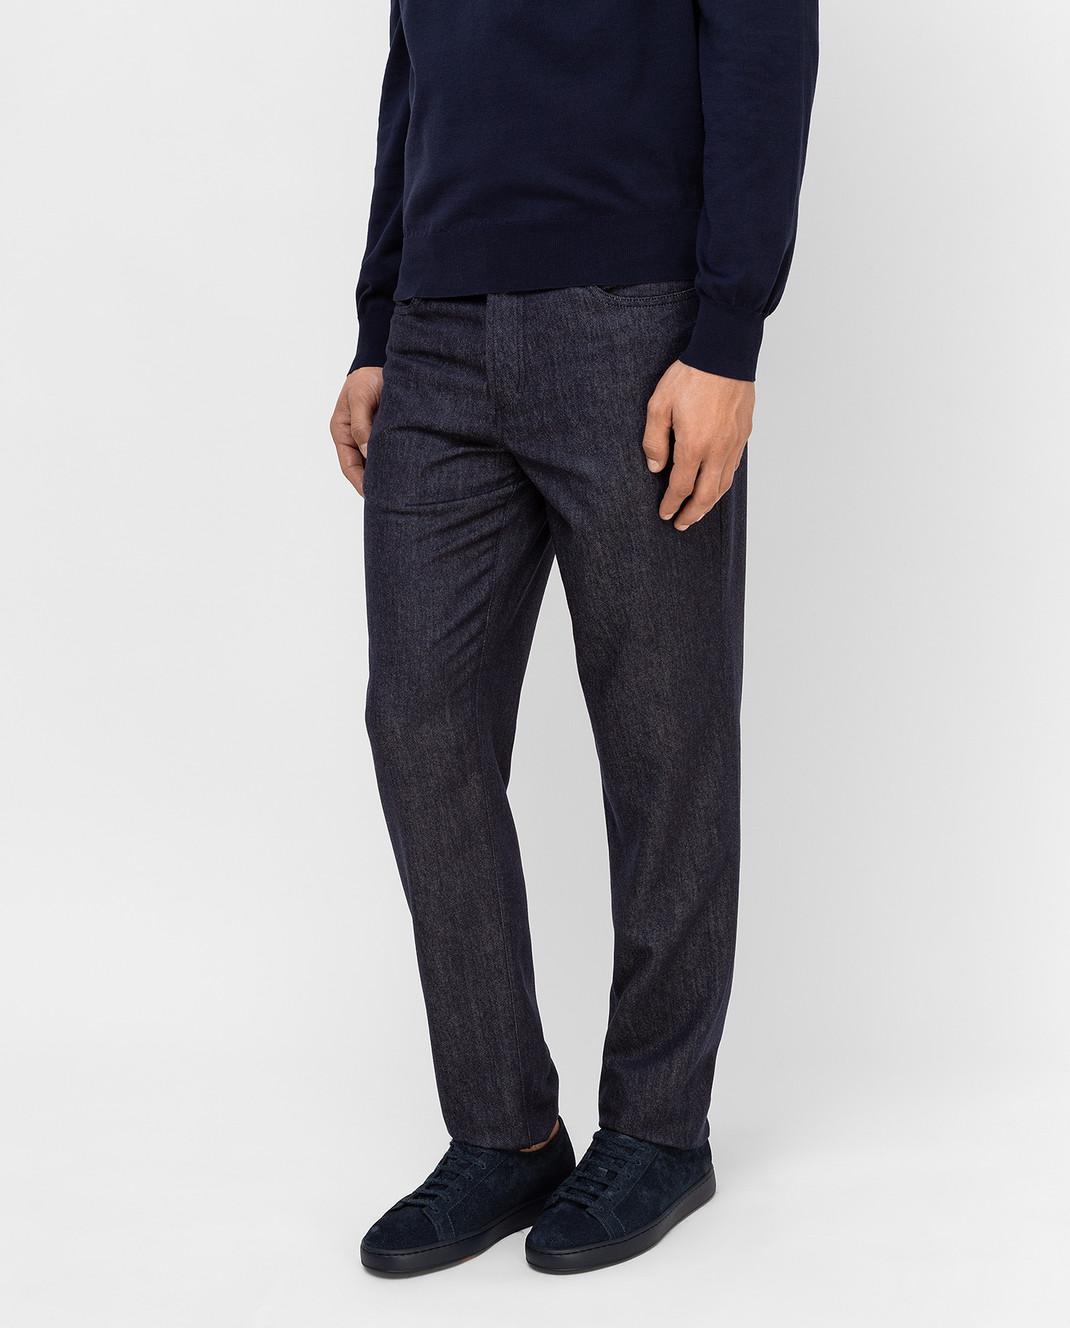 Brunello Cucinelli Темно-синие брюки из шерсти изображение 3